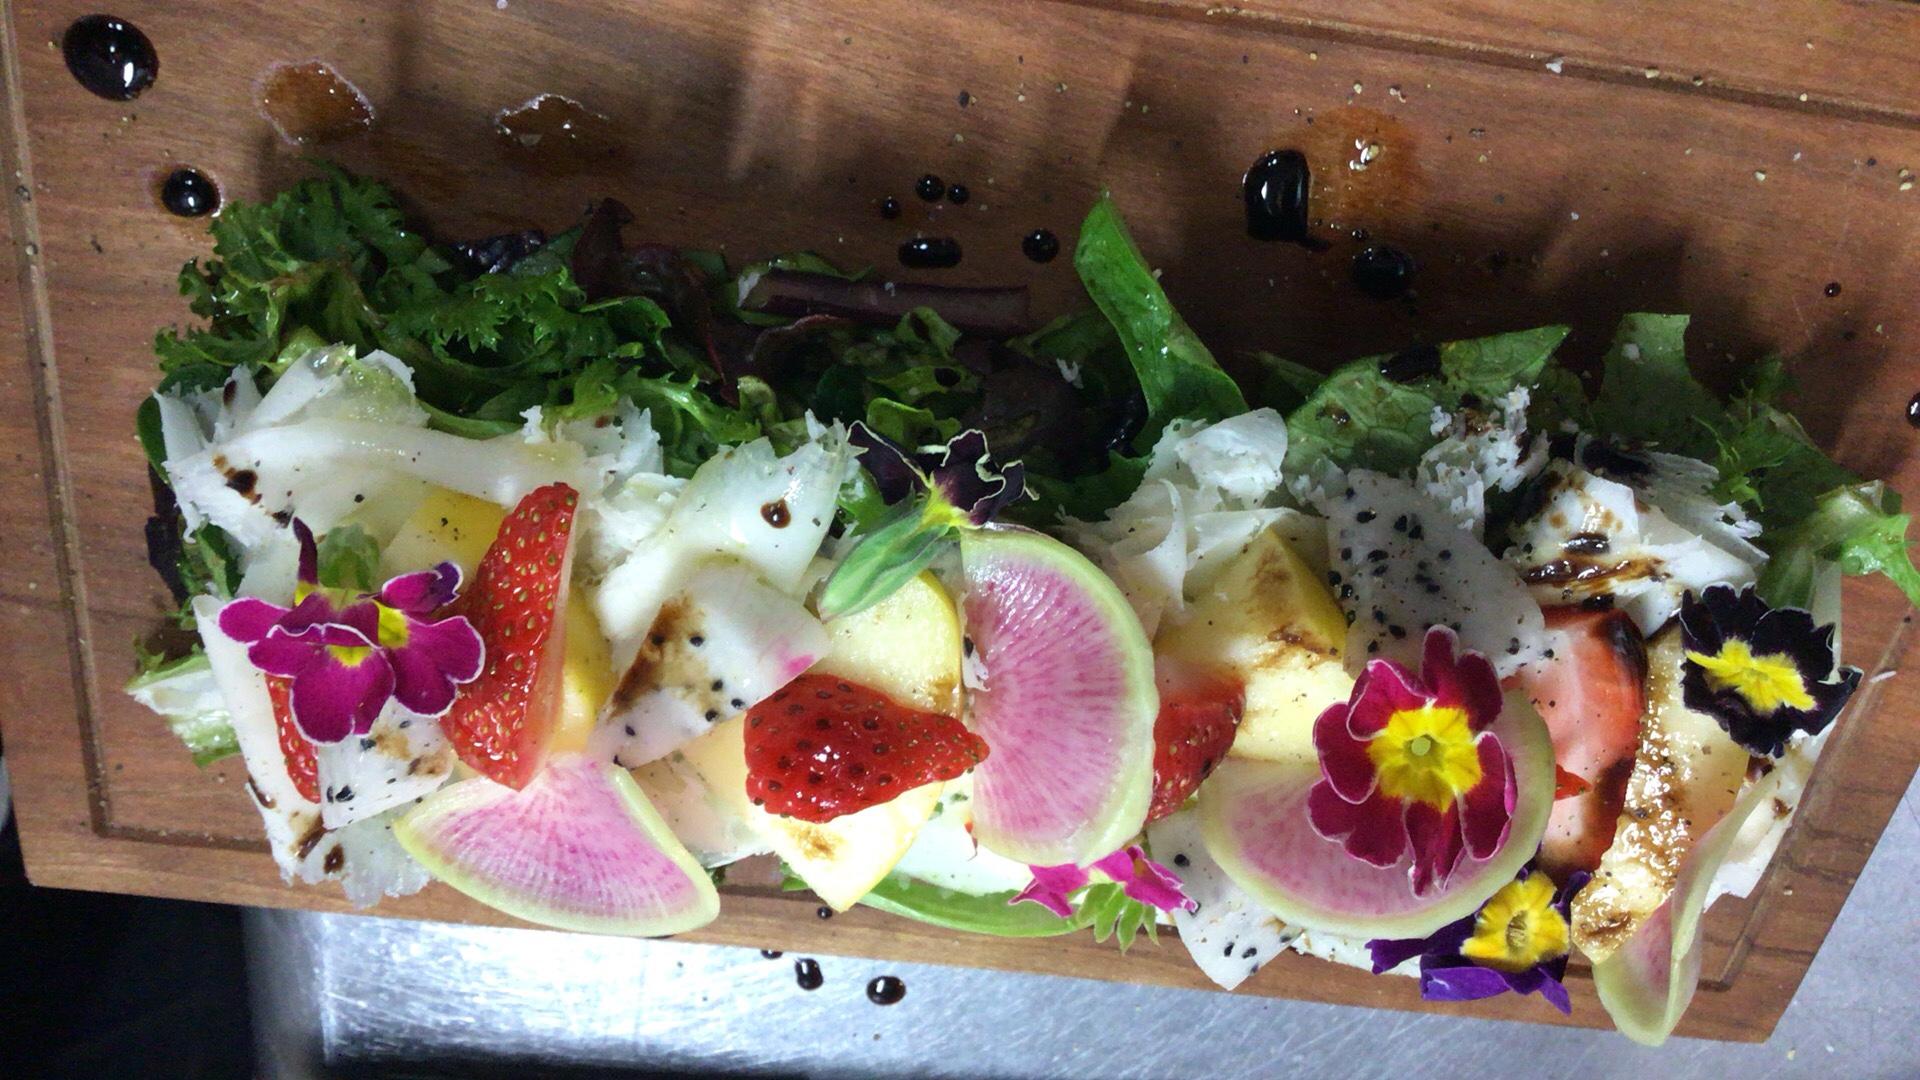 insalatabellalodiのinsalataの旬のサラダの地元野菜のディナーのアラカルトのベラロディチーズと果実のサラダのワイン合わせますのトロンコーネの新所沢イタリアンの所沢レストランのおいしいディナーのおすすめ